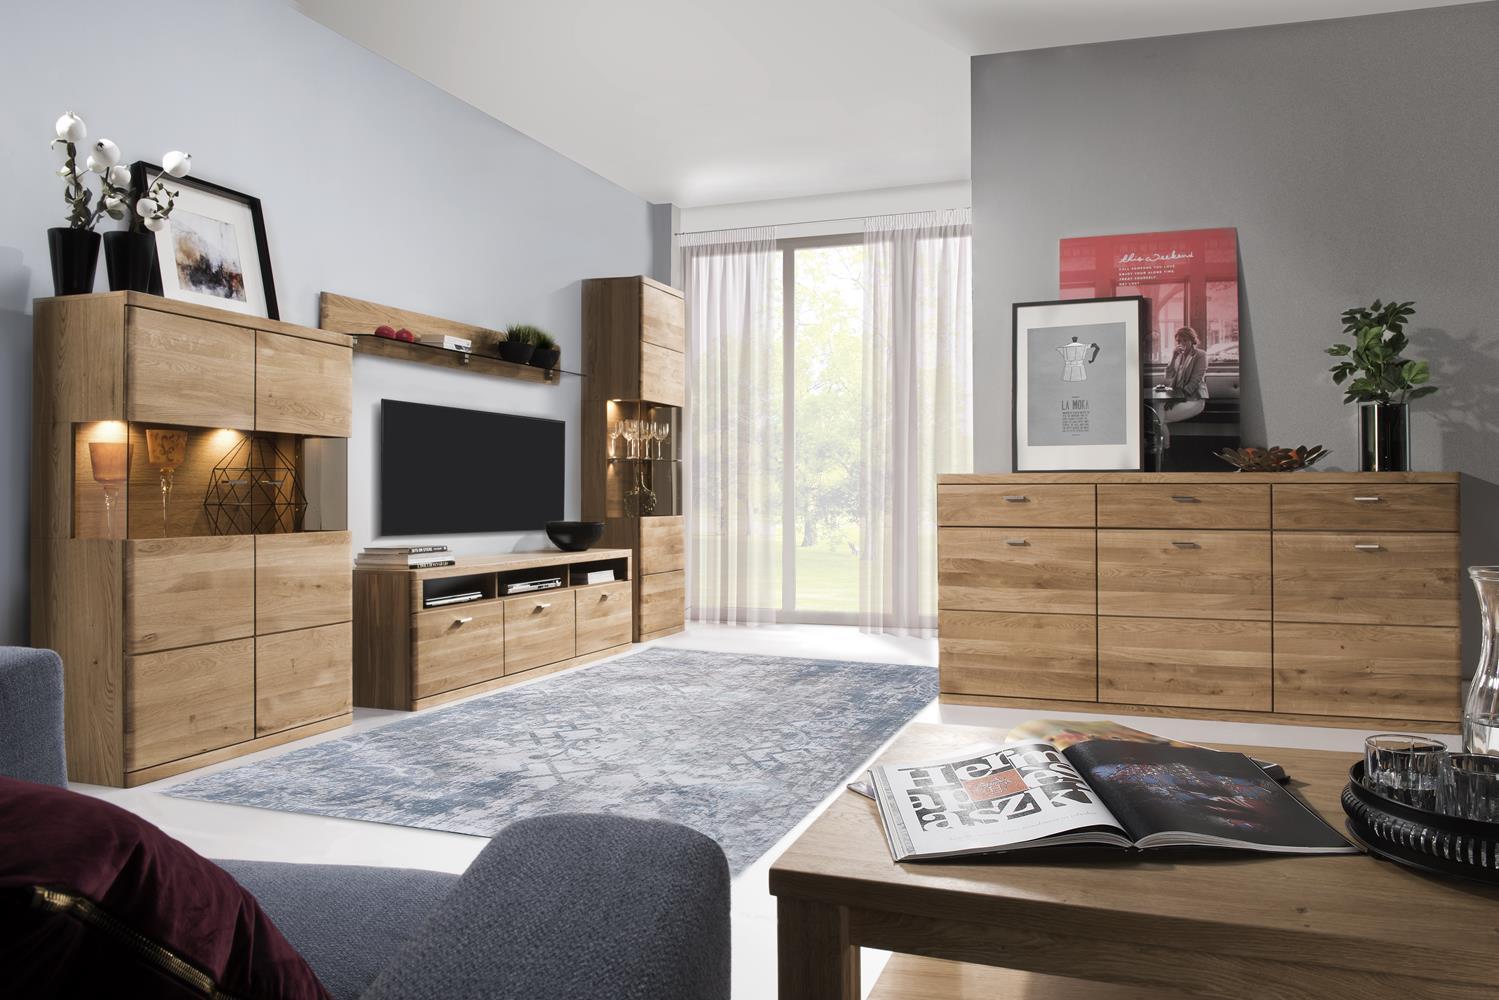 drewniana-kolekcja-mebli-do-salonu